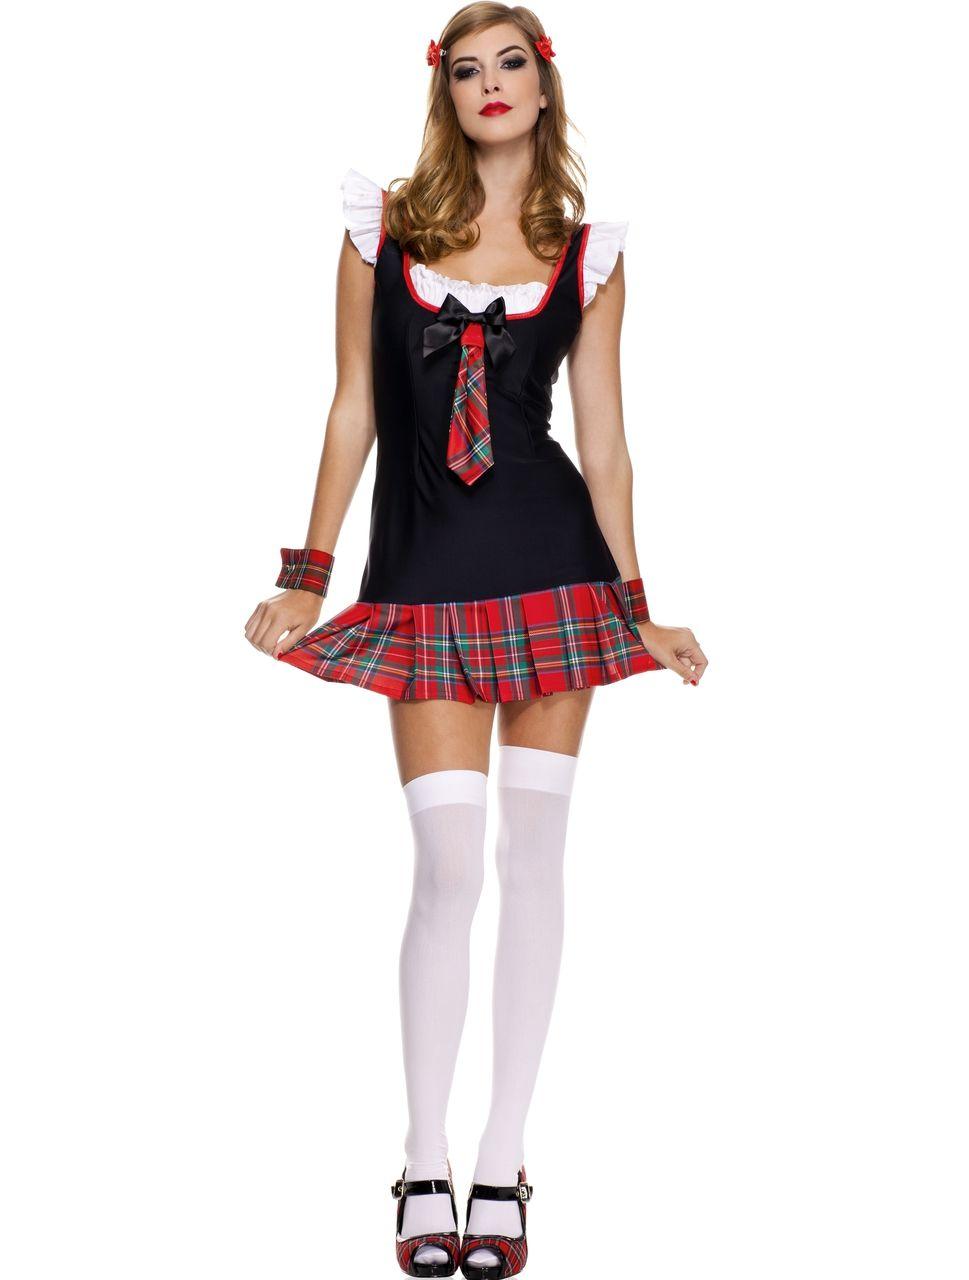 Music legs red plaid skirt school bedroom costume